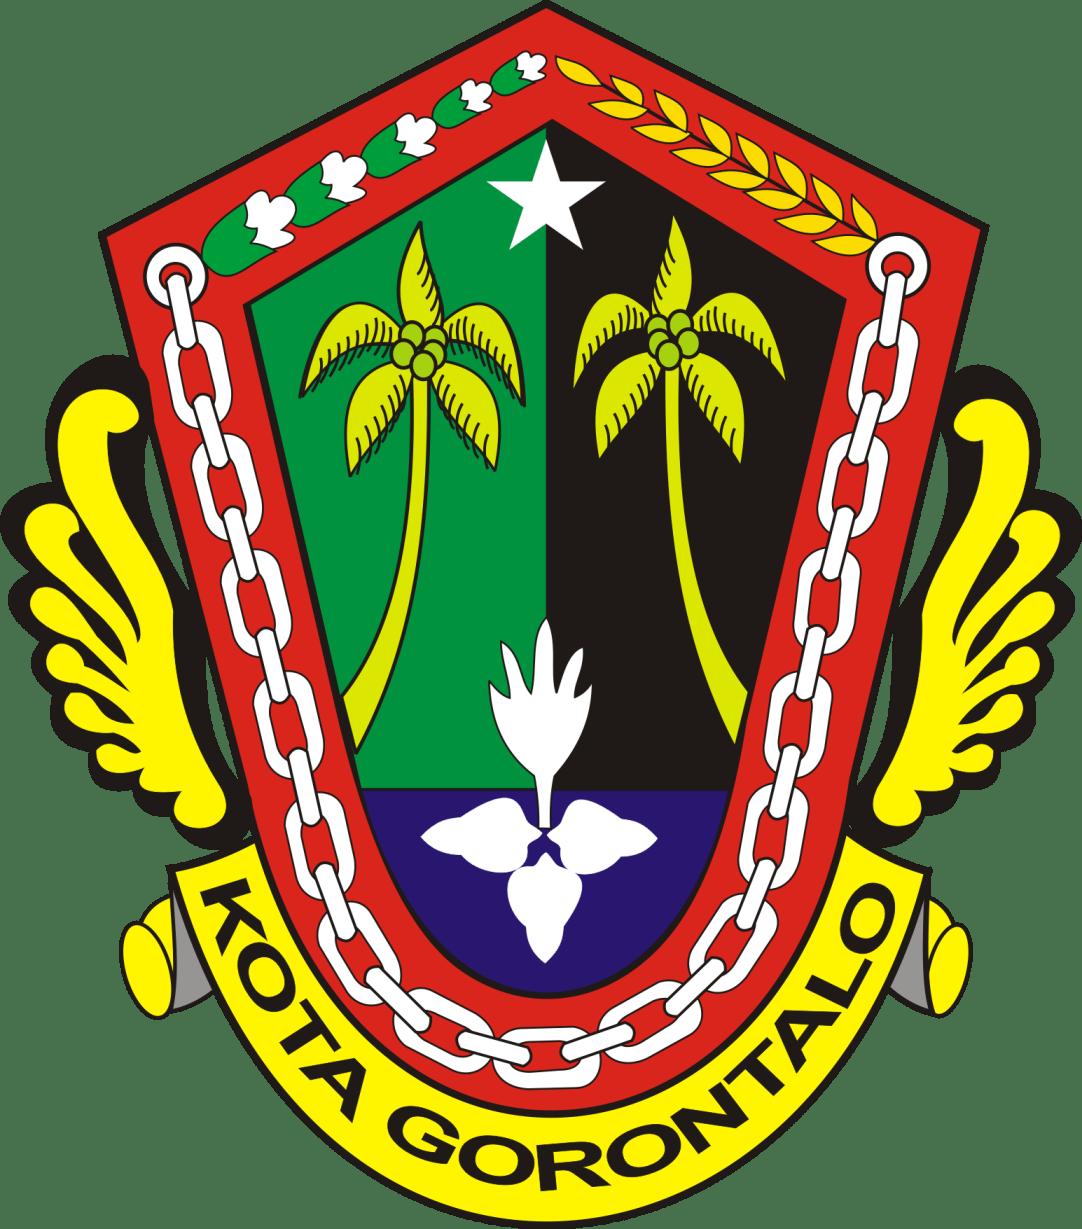 Berkas Logo Kota Gorontalo Png Wikipedia Bahasa Indonesia